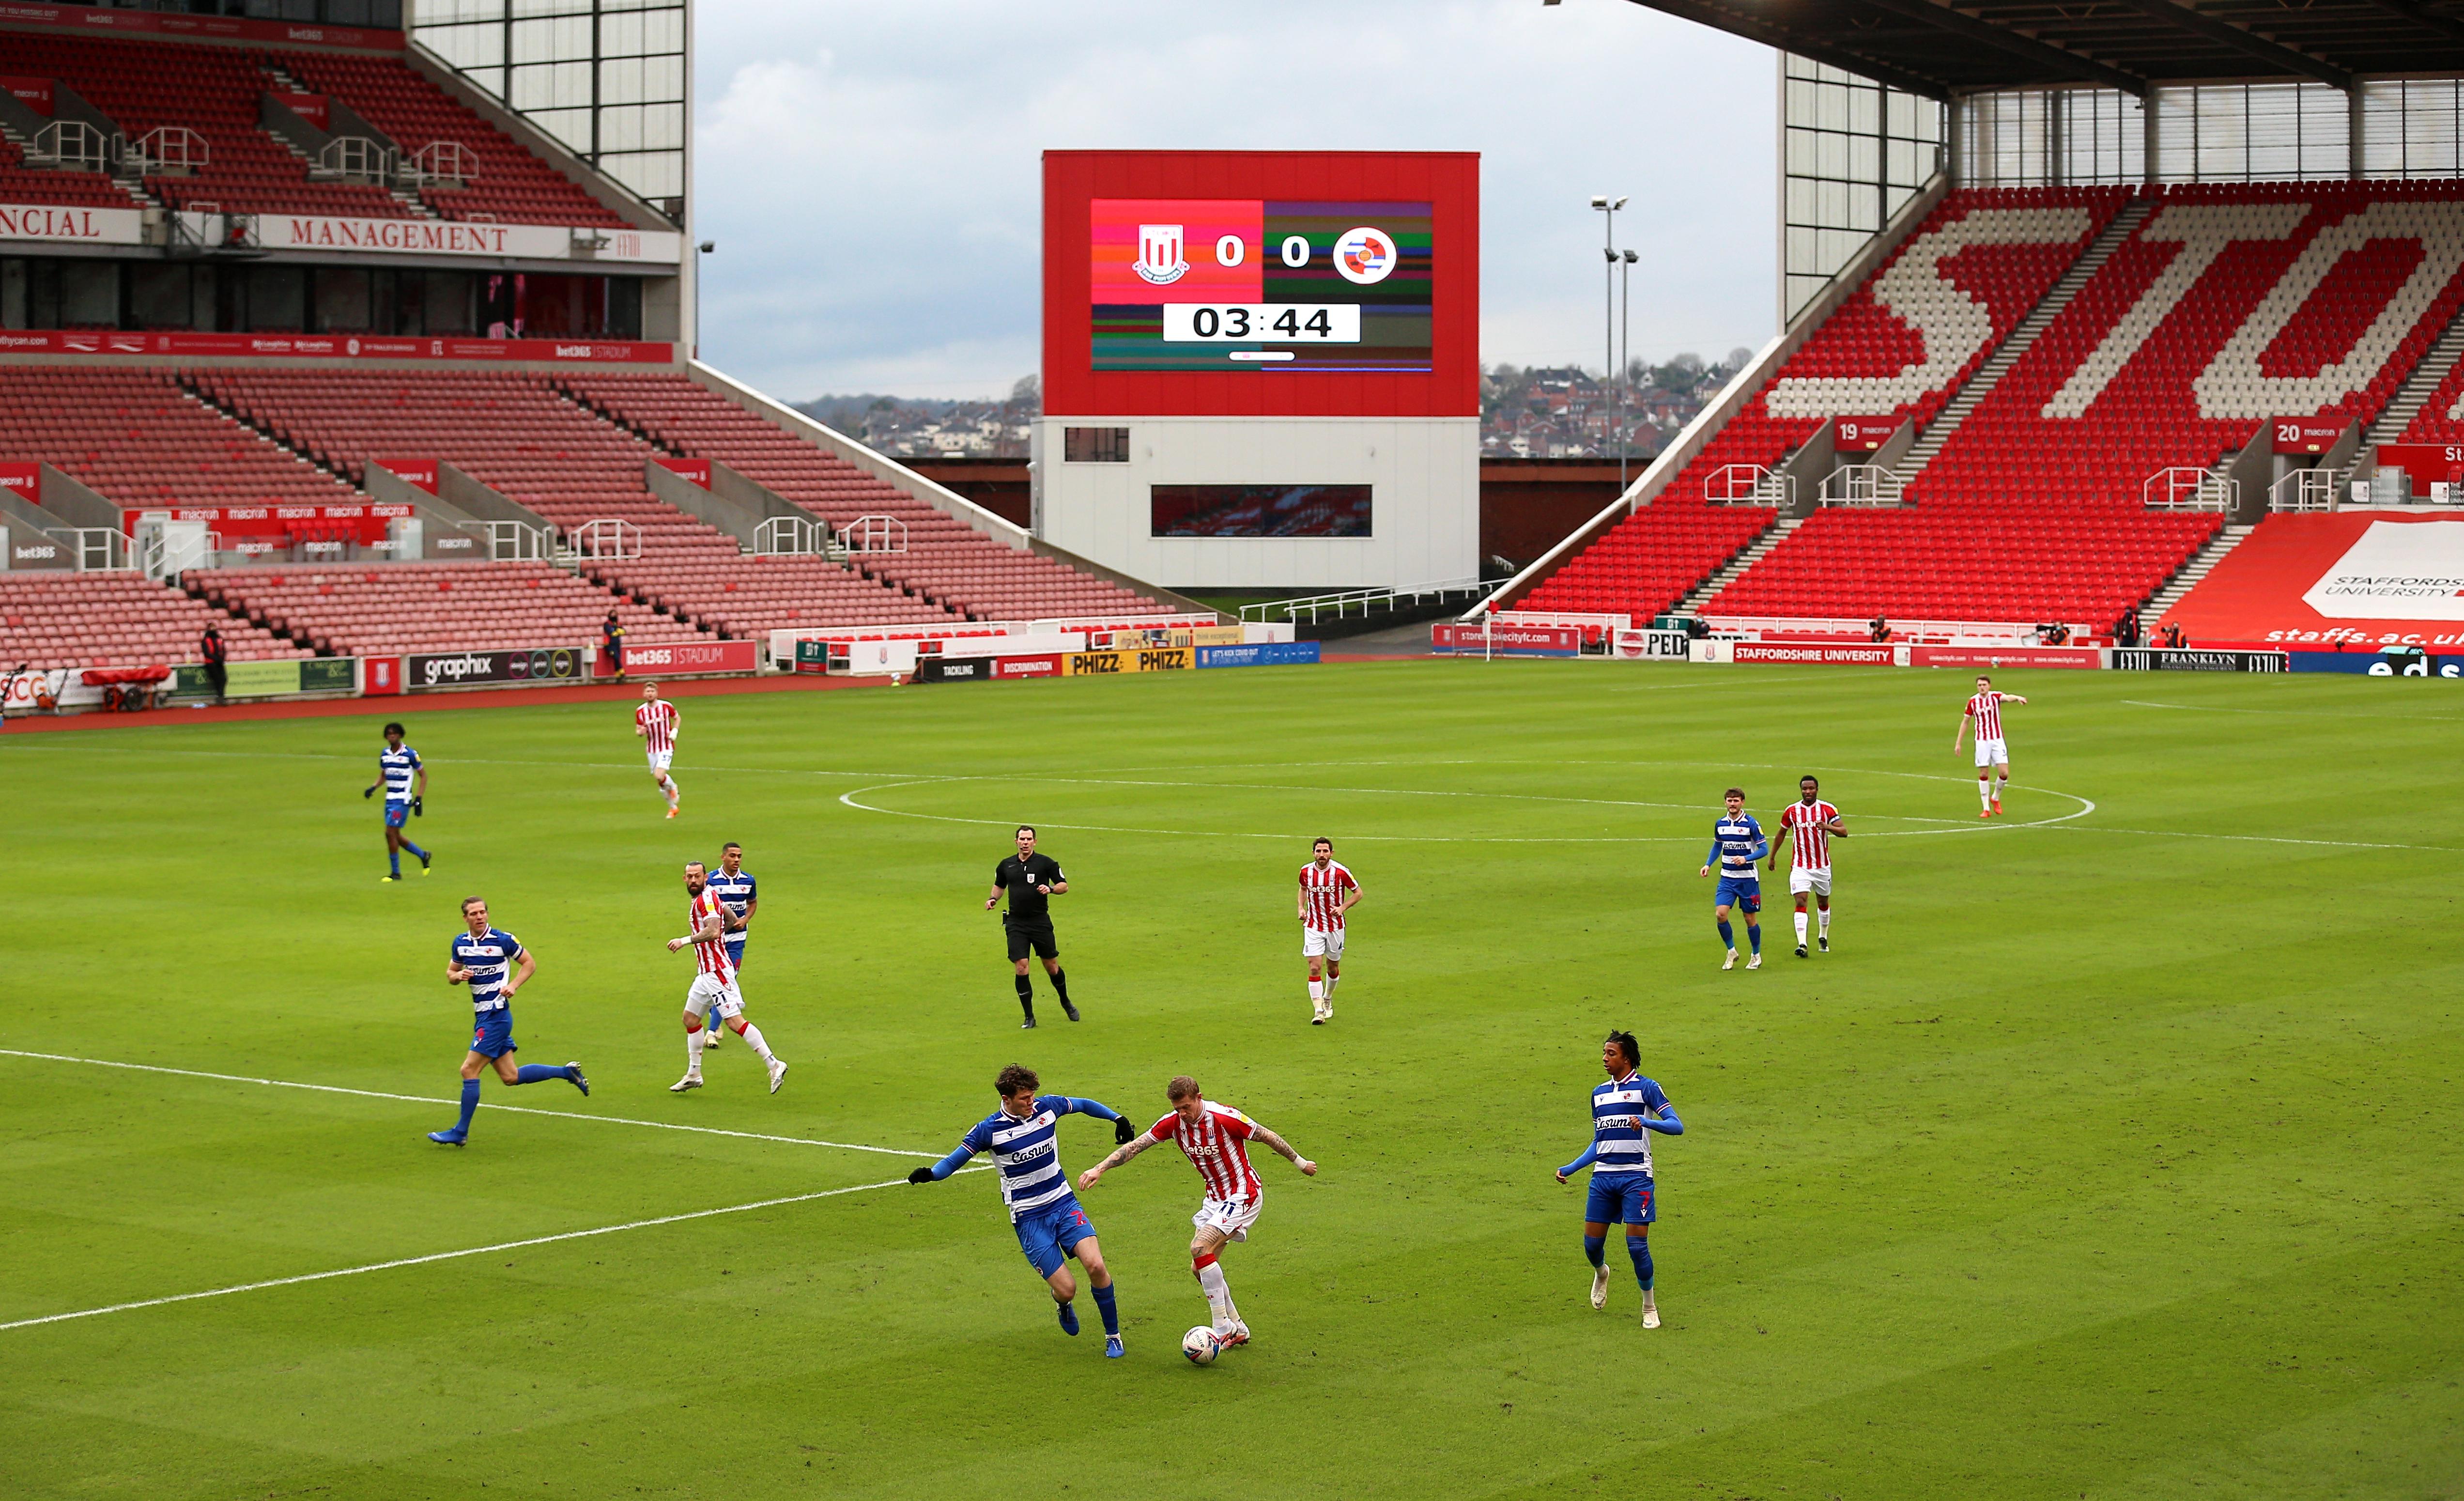 Stoke City v Reading - Sky Bet Championship - bet365 Stadium